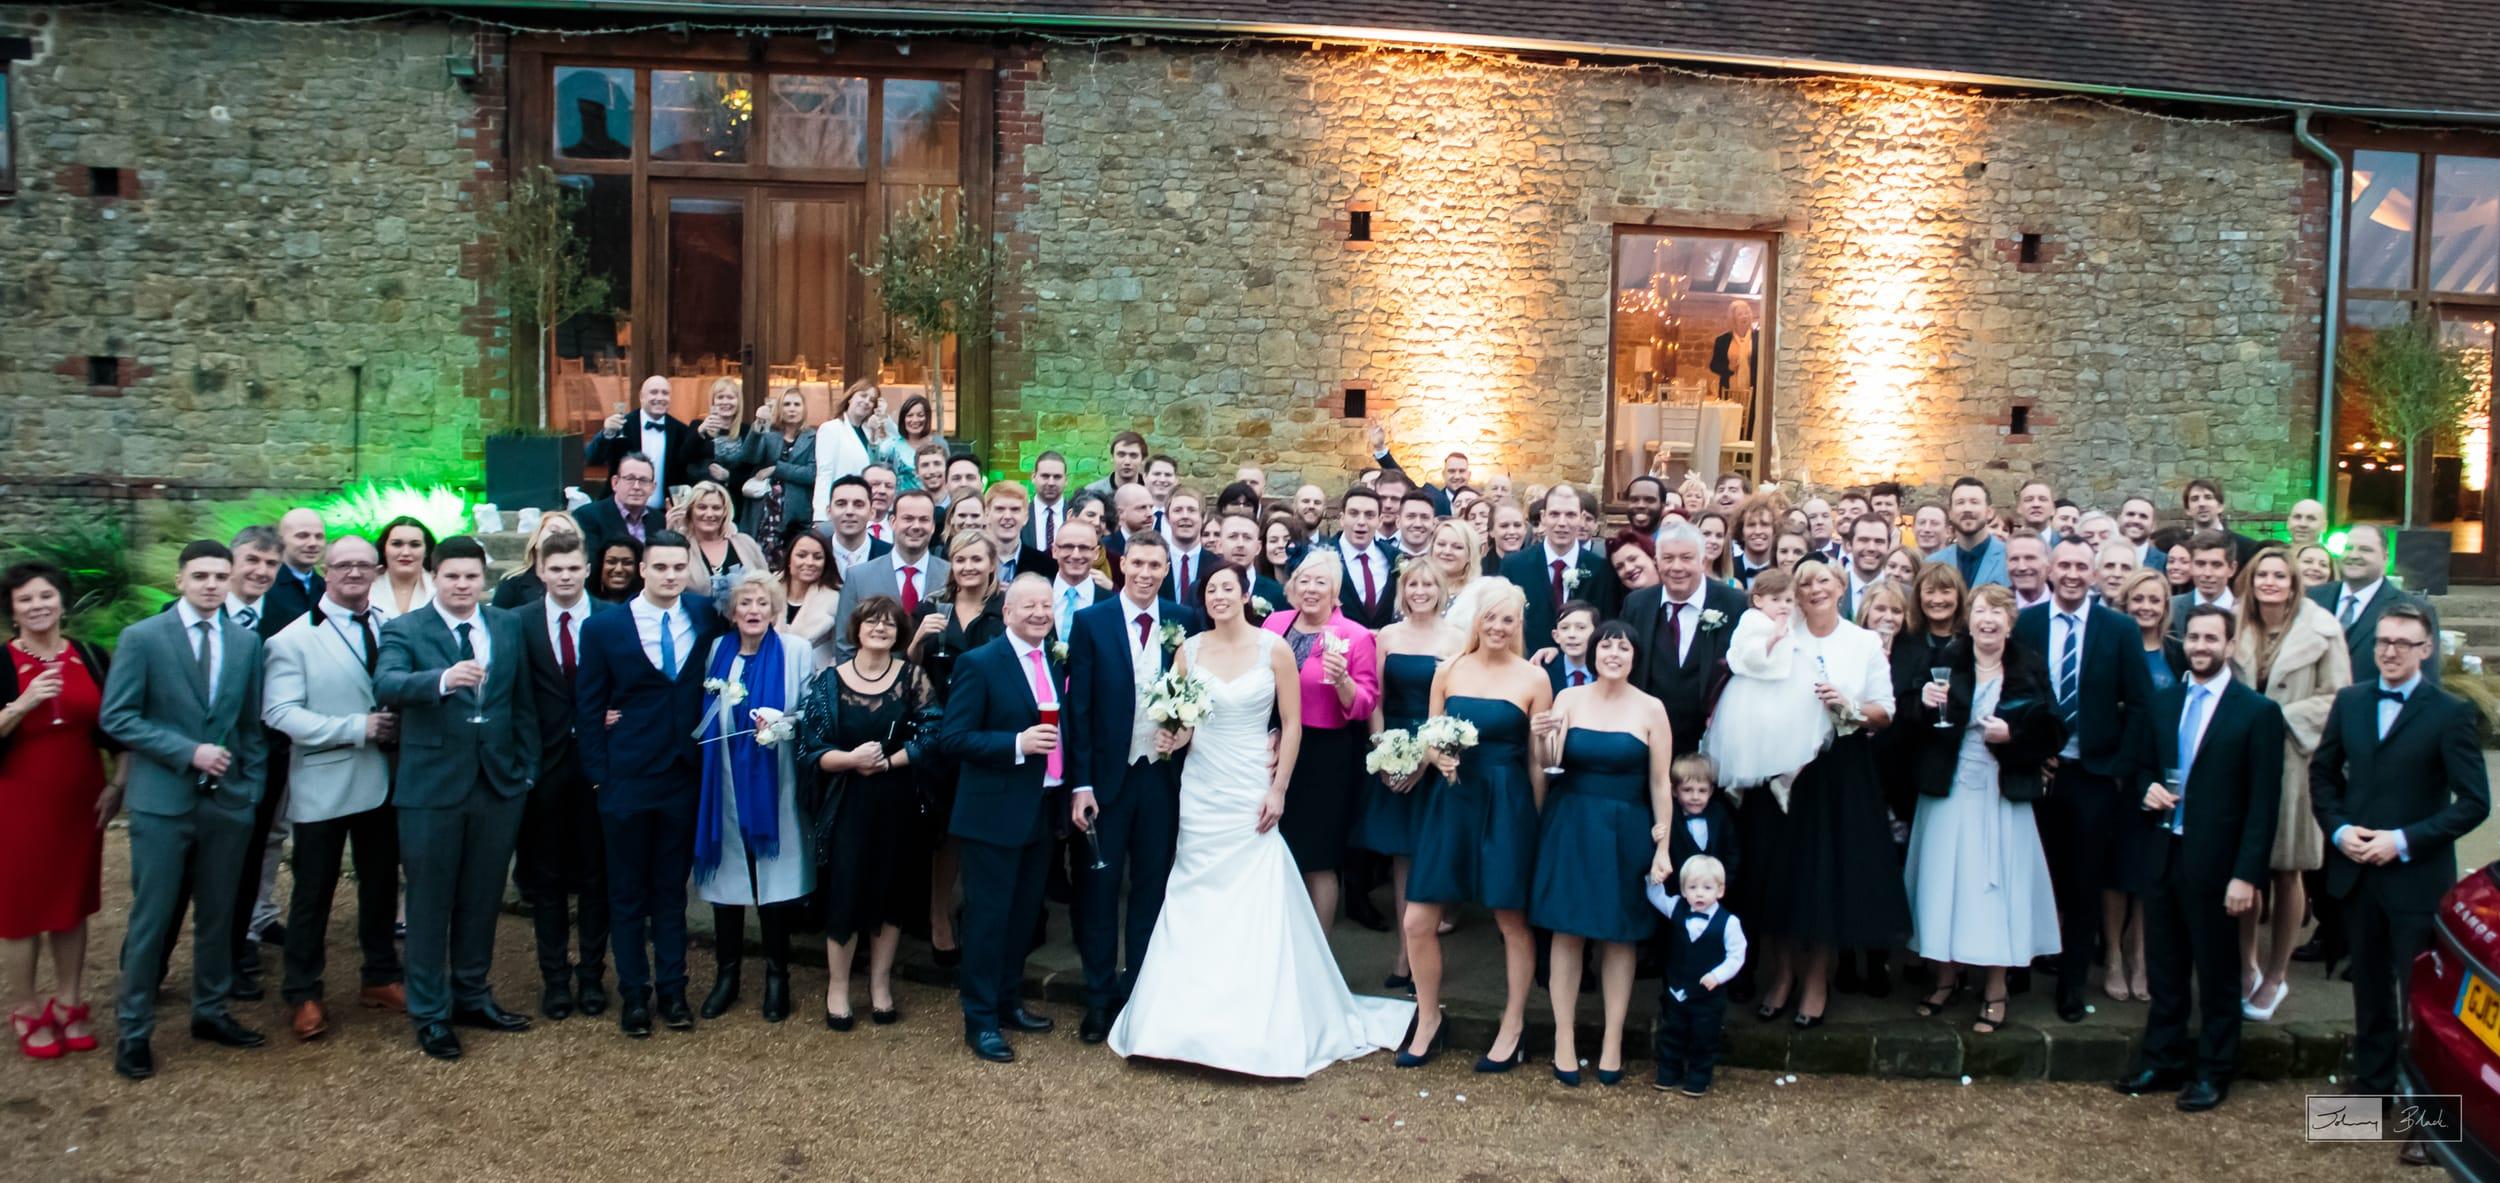 Johnny Black Hampshire Wedding Photography Dan Vicki 7.jpg